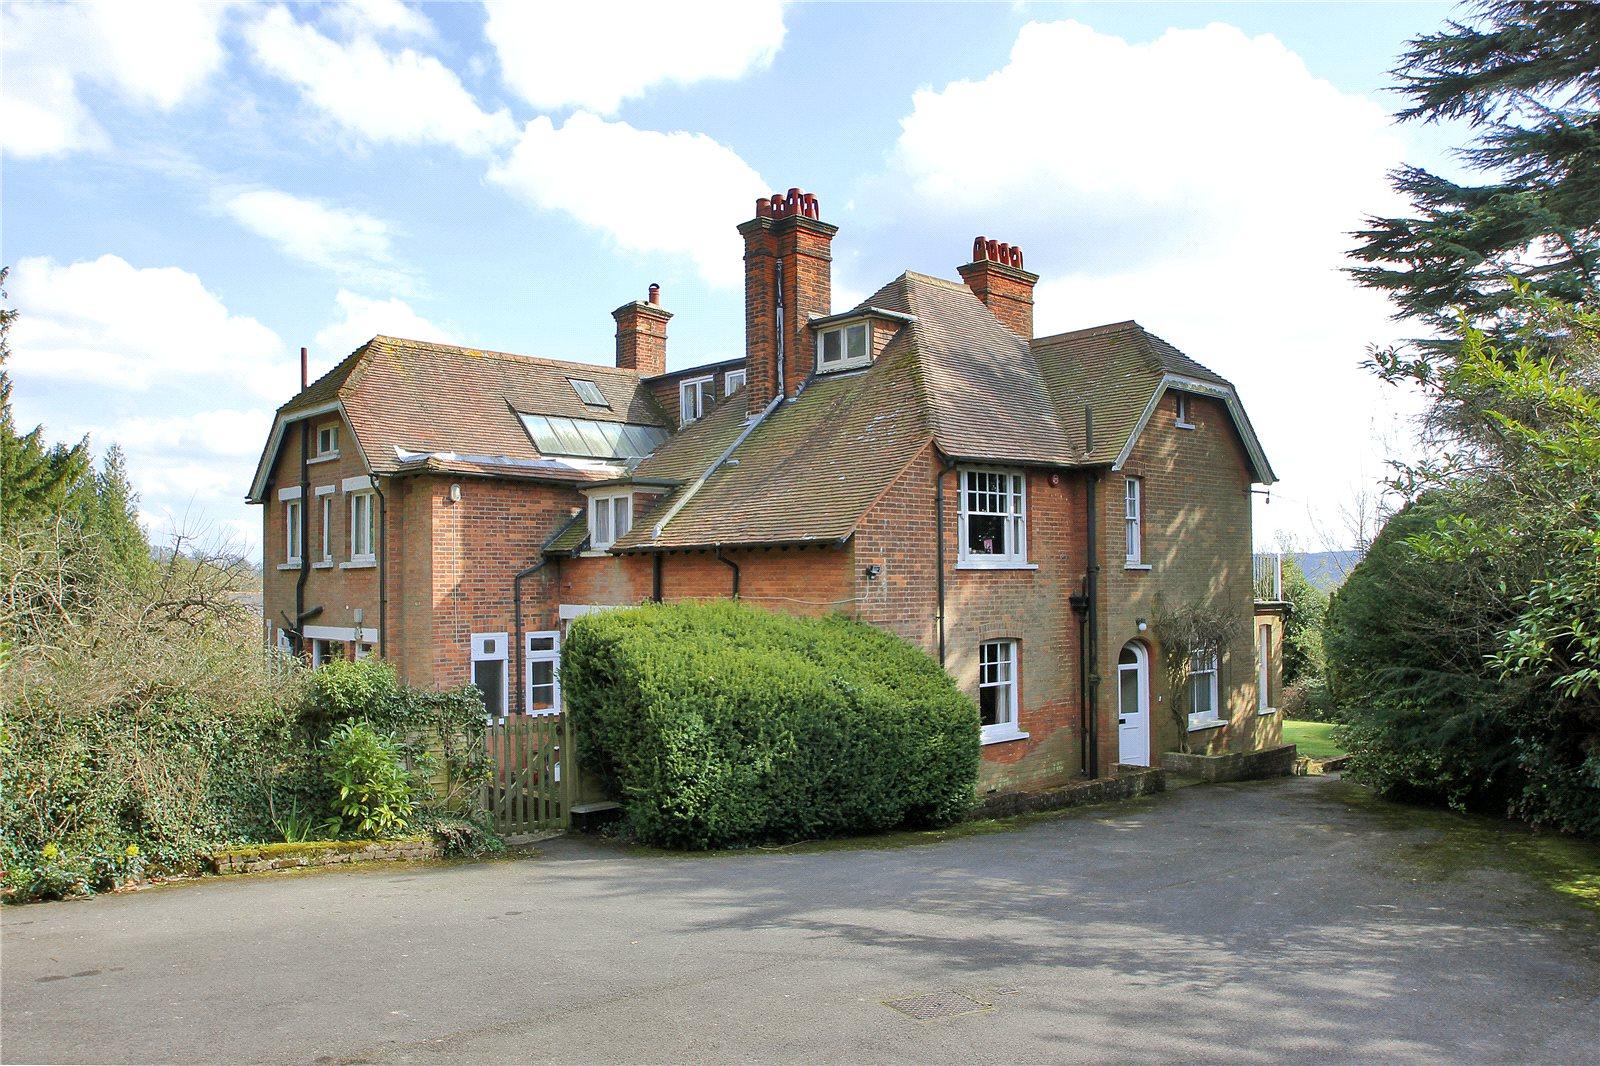 Частный дом для того Продажа на Cotmans Ash Lane, Kemsing, Sevenoaks, Kent, TN15 Sevenoaks, Англия